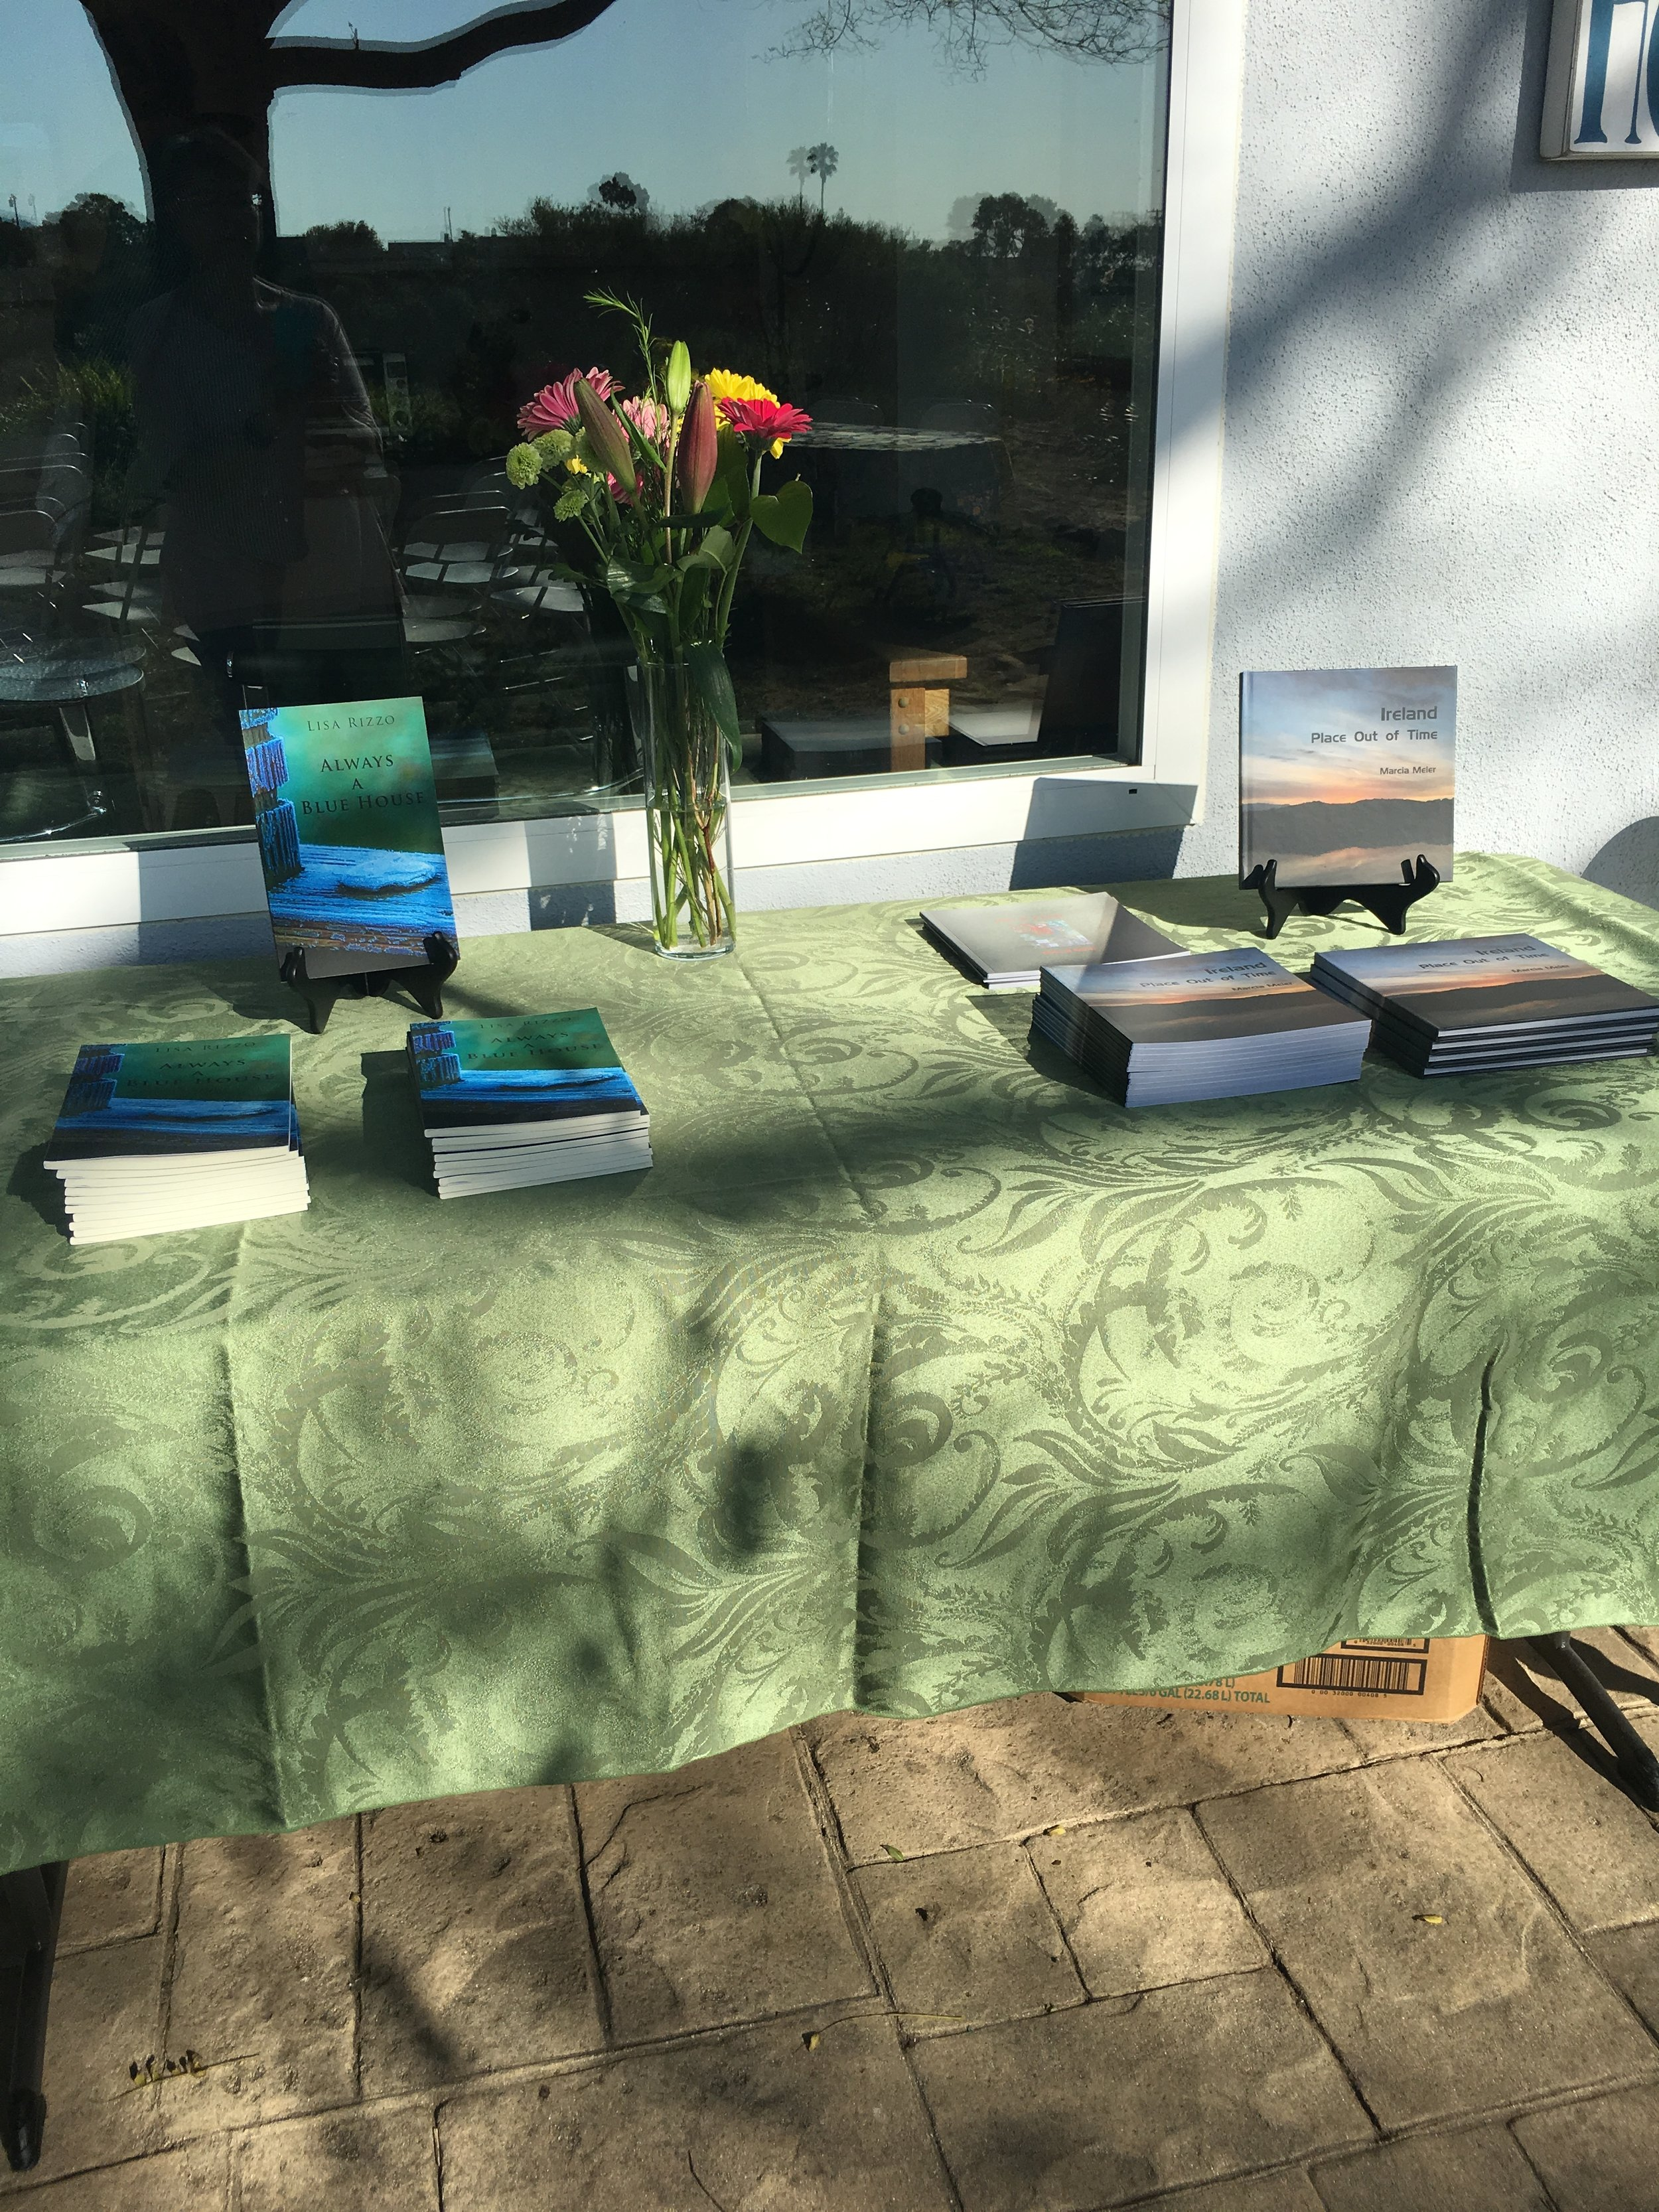 Poetry Salon - A beautiful evening in Santa Barbara